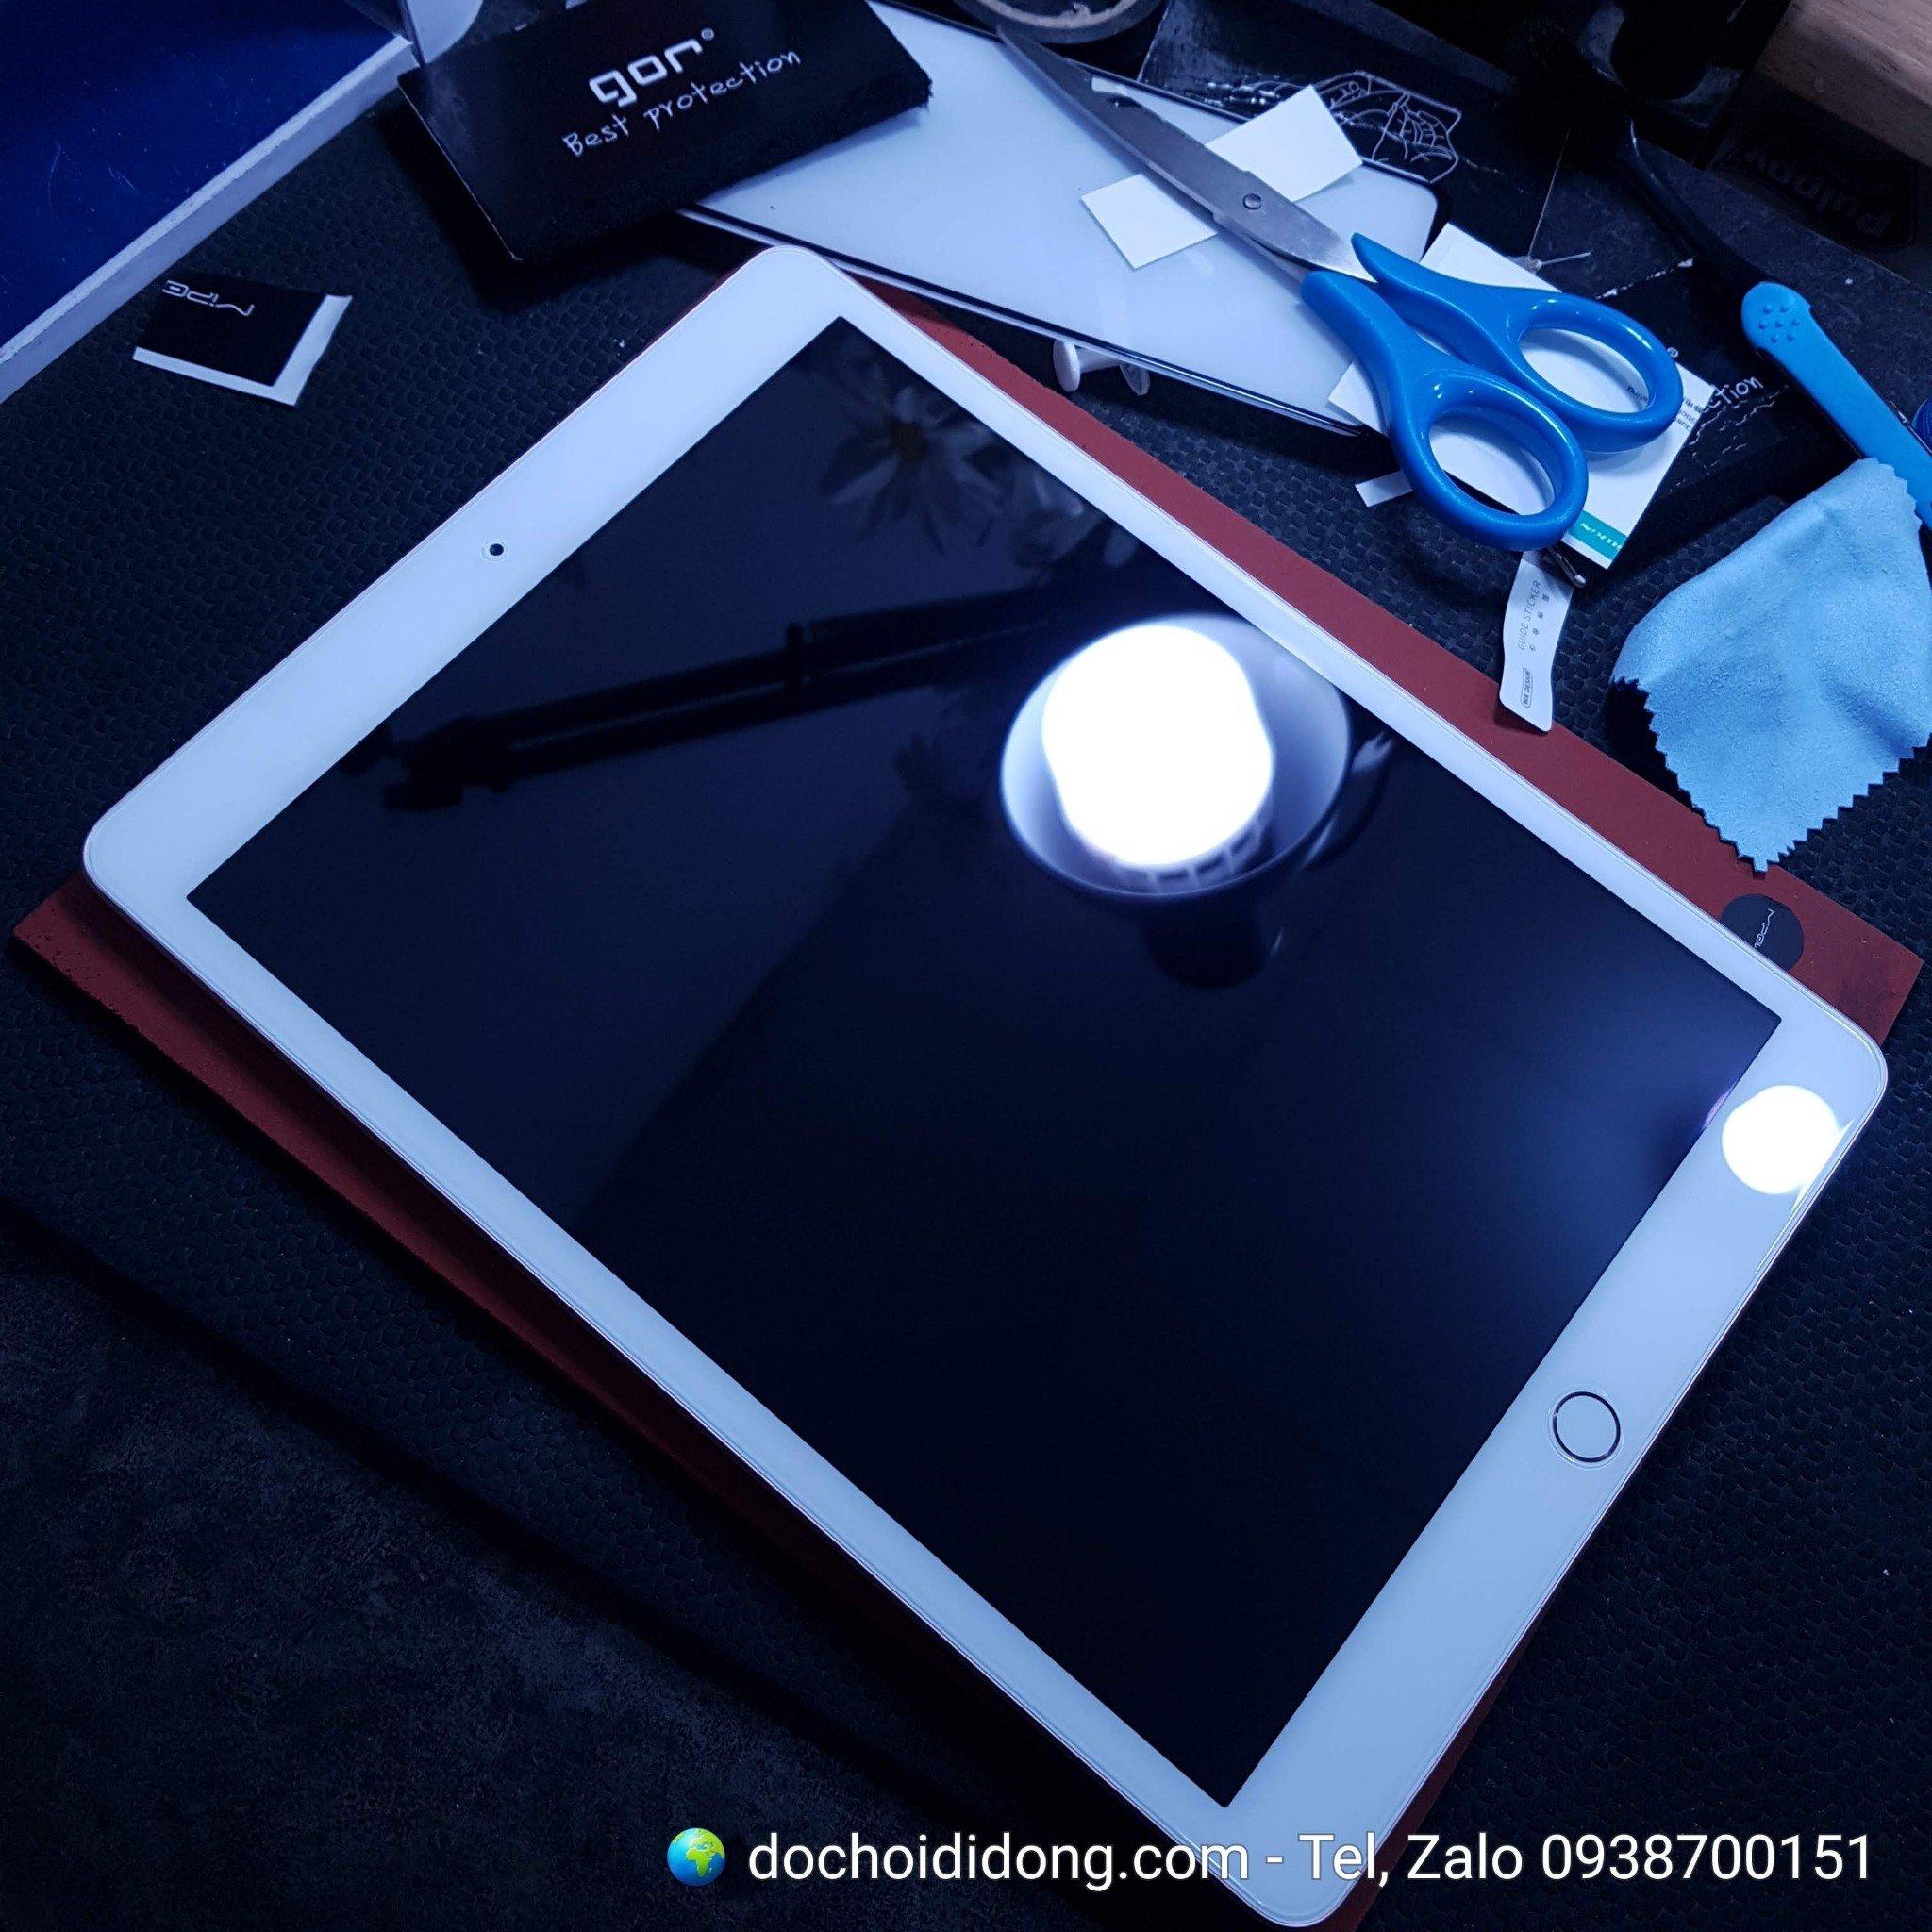 cuong-luc-ipad-10-2-zacase-tablet-premium